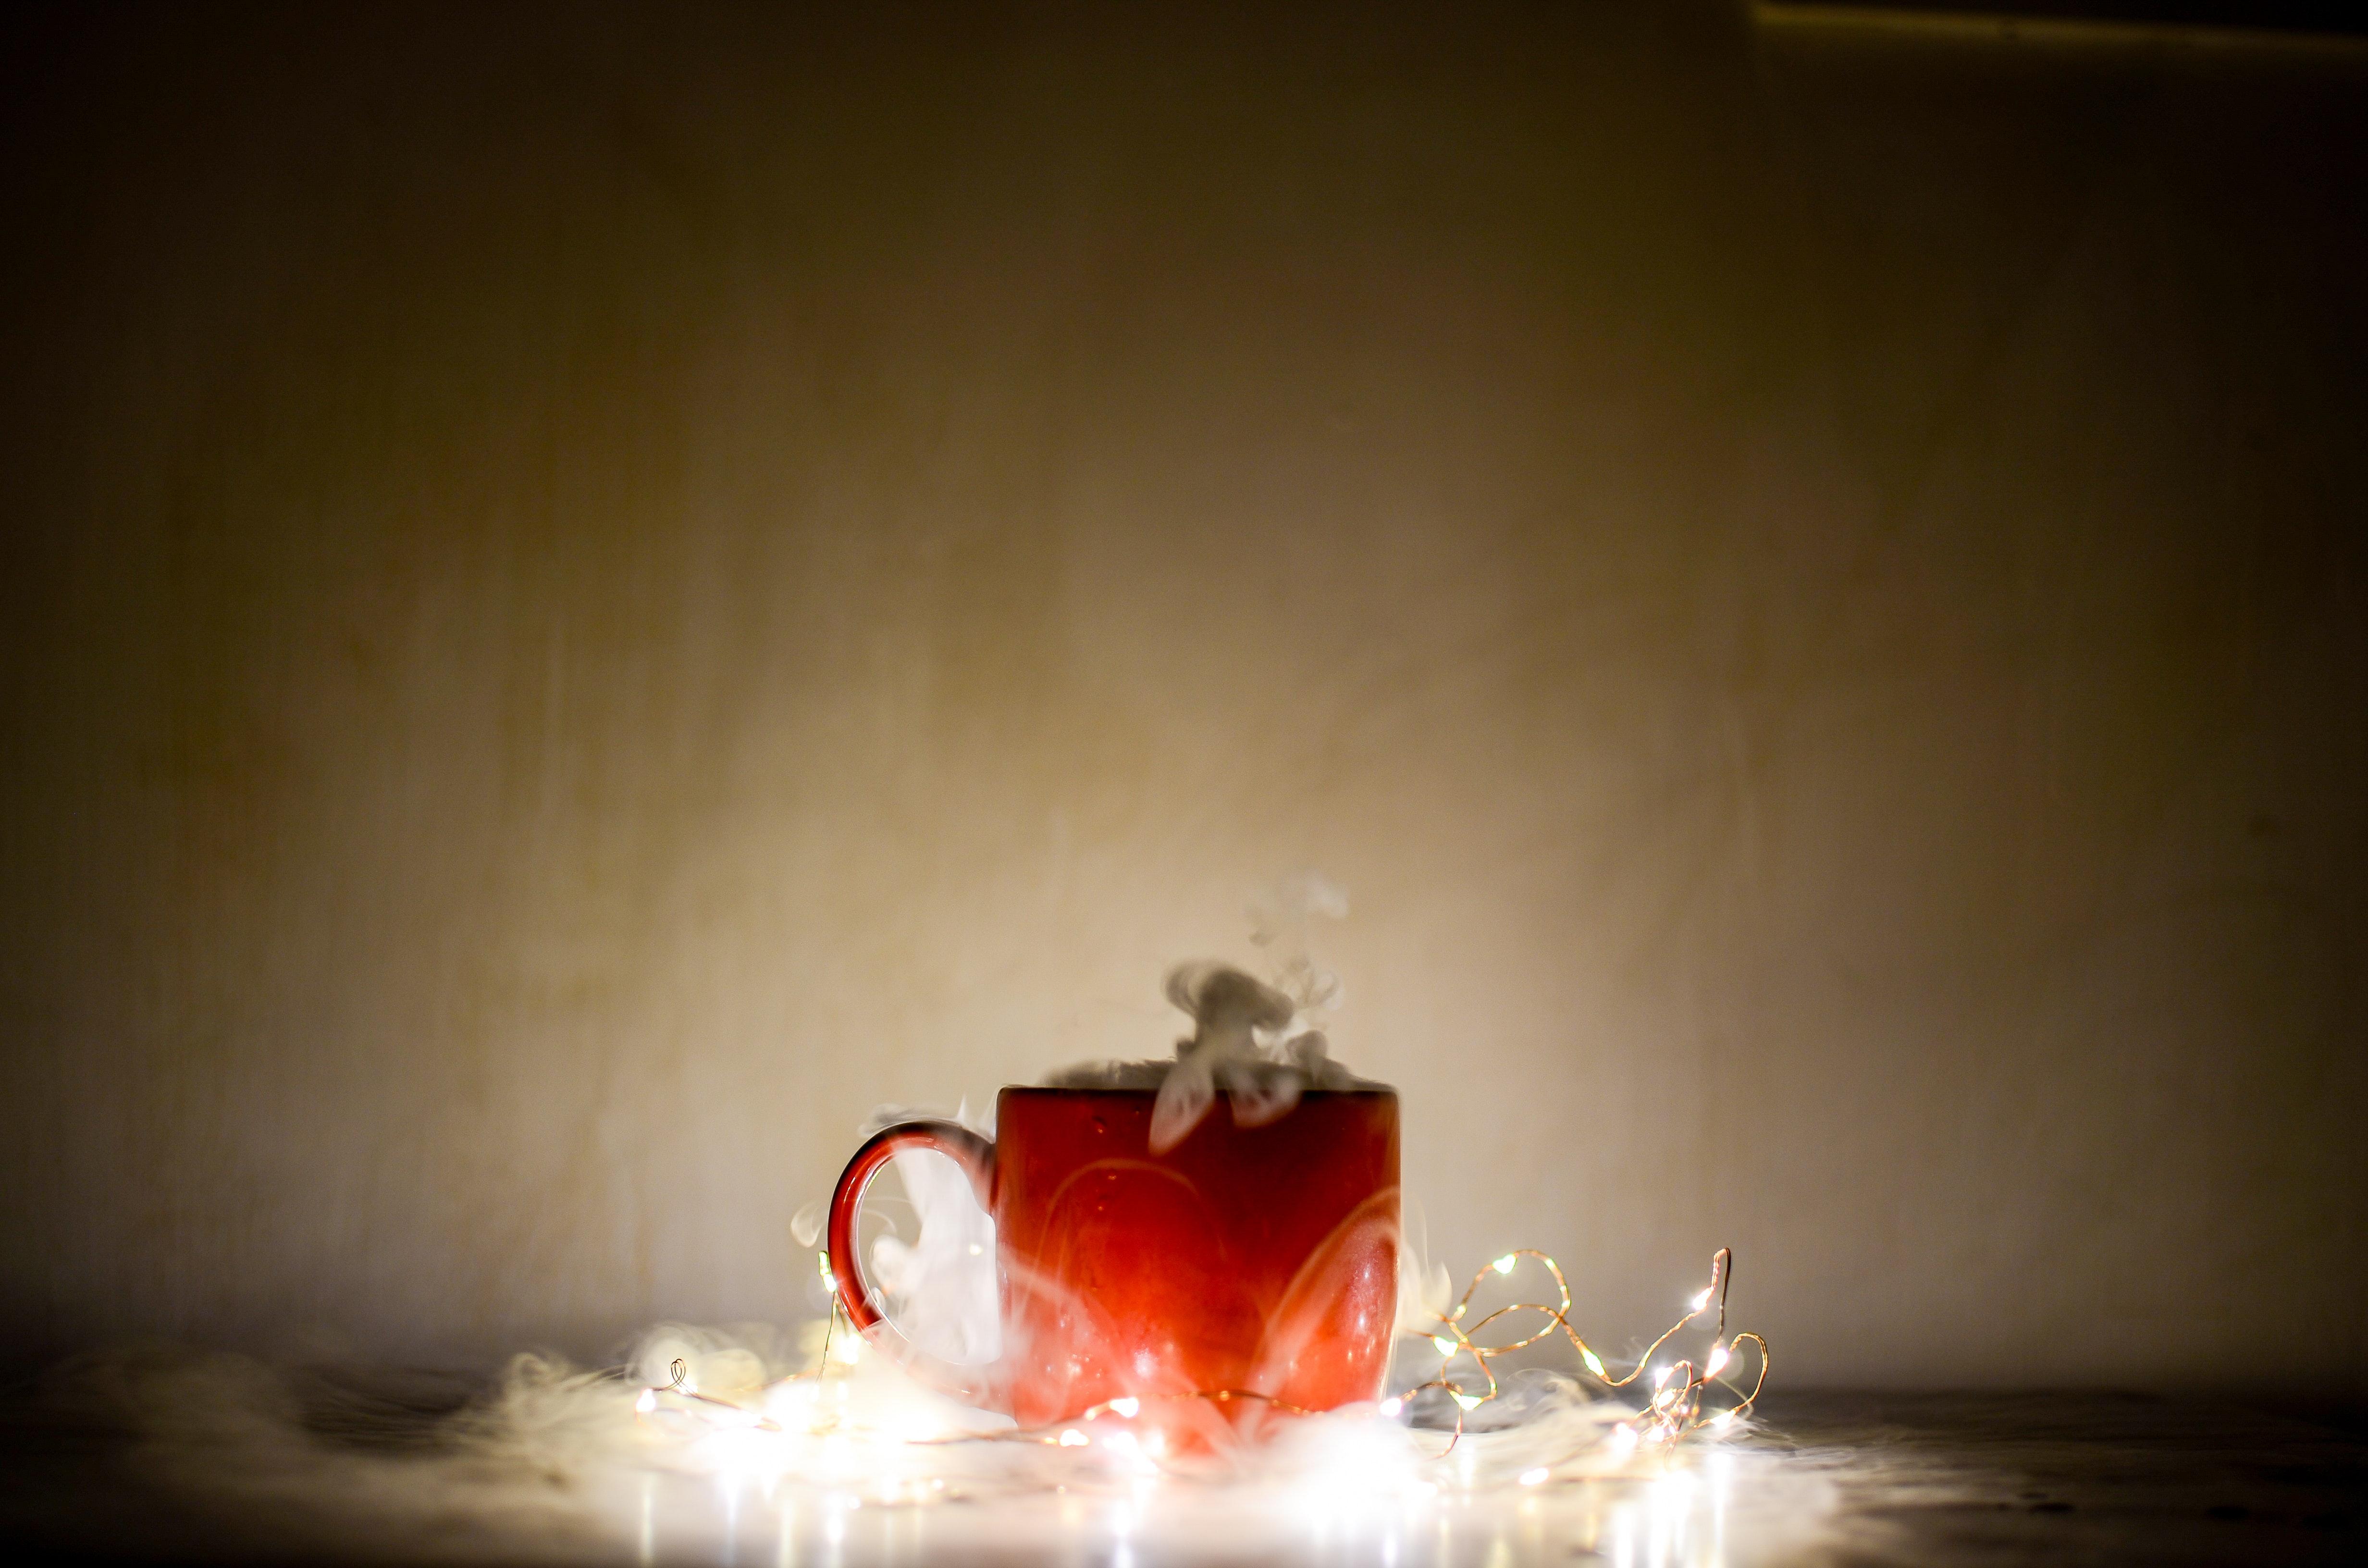 Red Ceramic Coffee Mug, Background, Magic, Holiday, Hot, HQ Photo